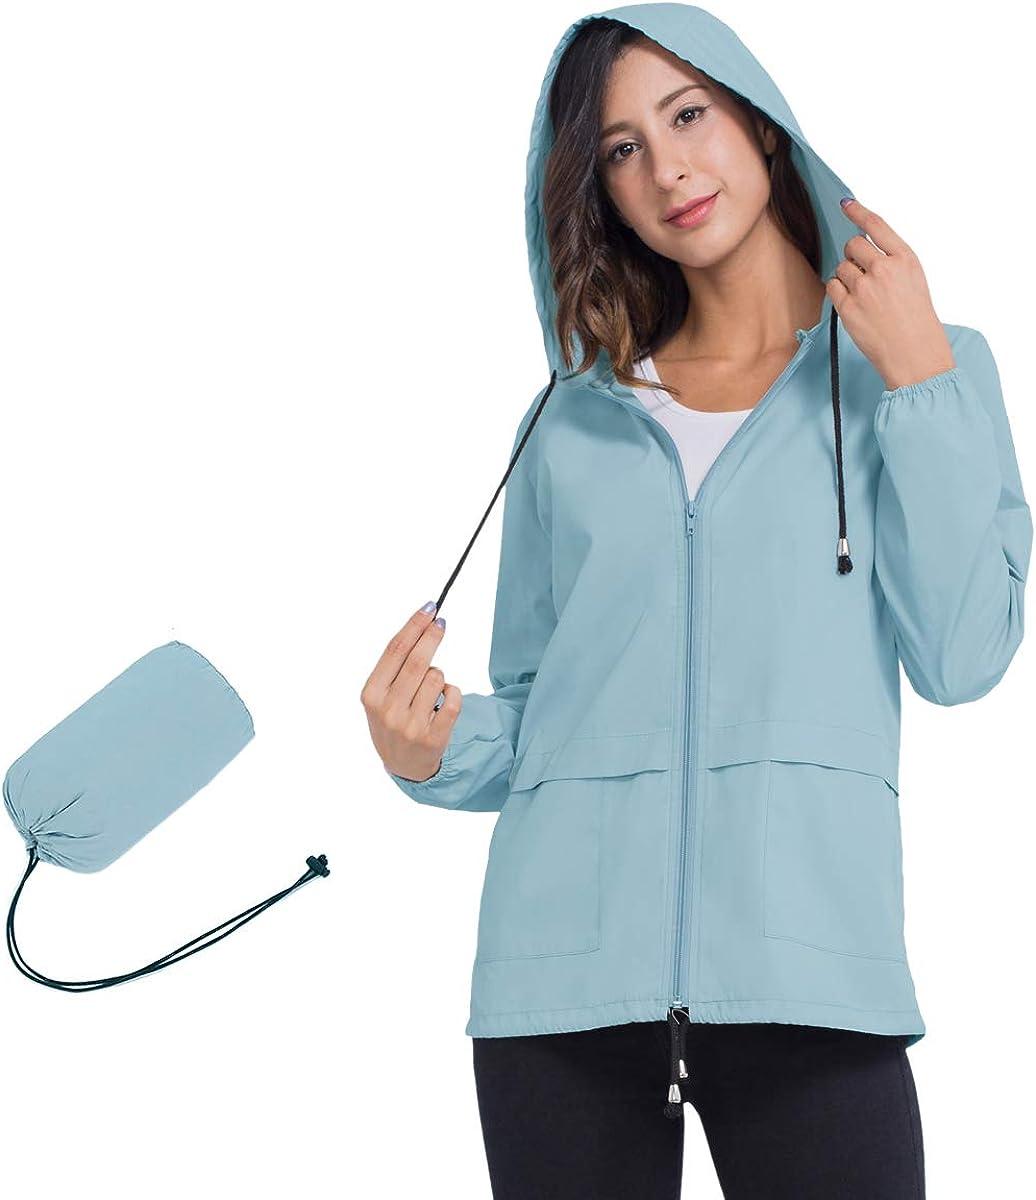 JTANIB Women's Lightweight Packable Waterproof Hooded Rain Jacket S-XXL